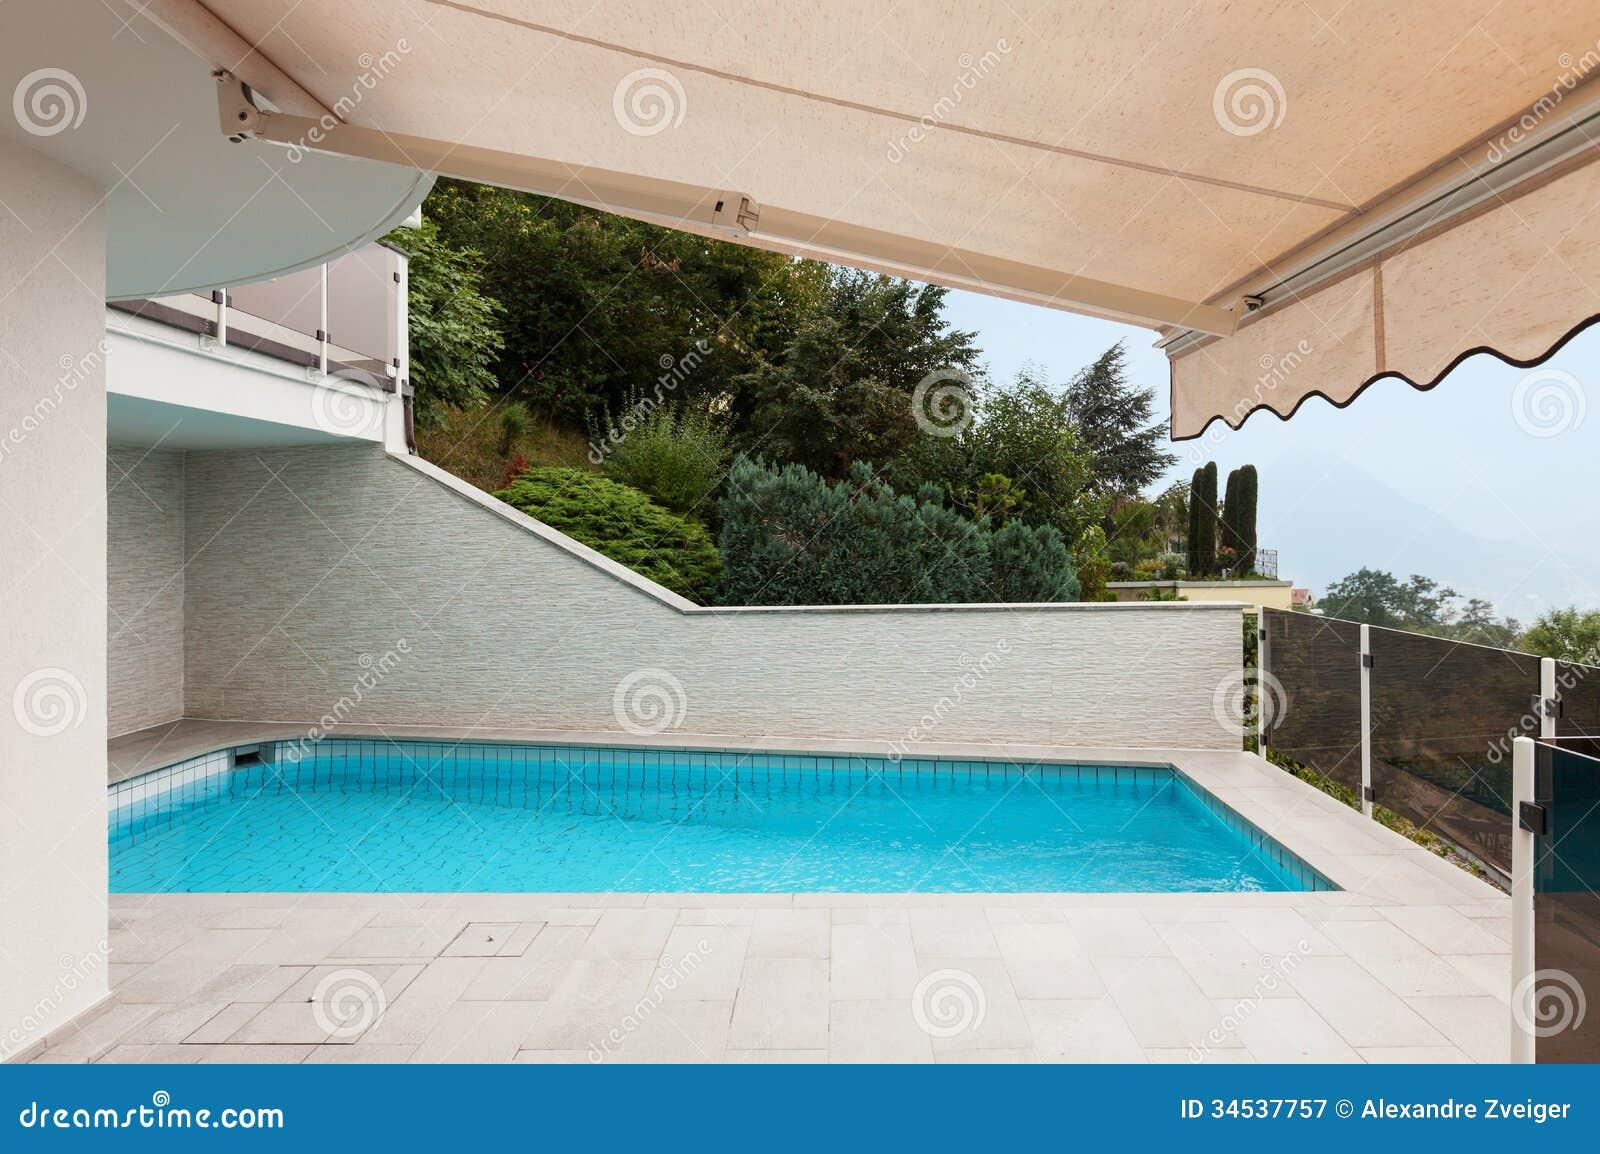 Piscina de la pizca de la arquitectura fotograf a de archivo libre de regal as imagen 34537757 - Business plan piscina ...